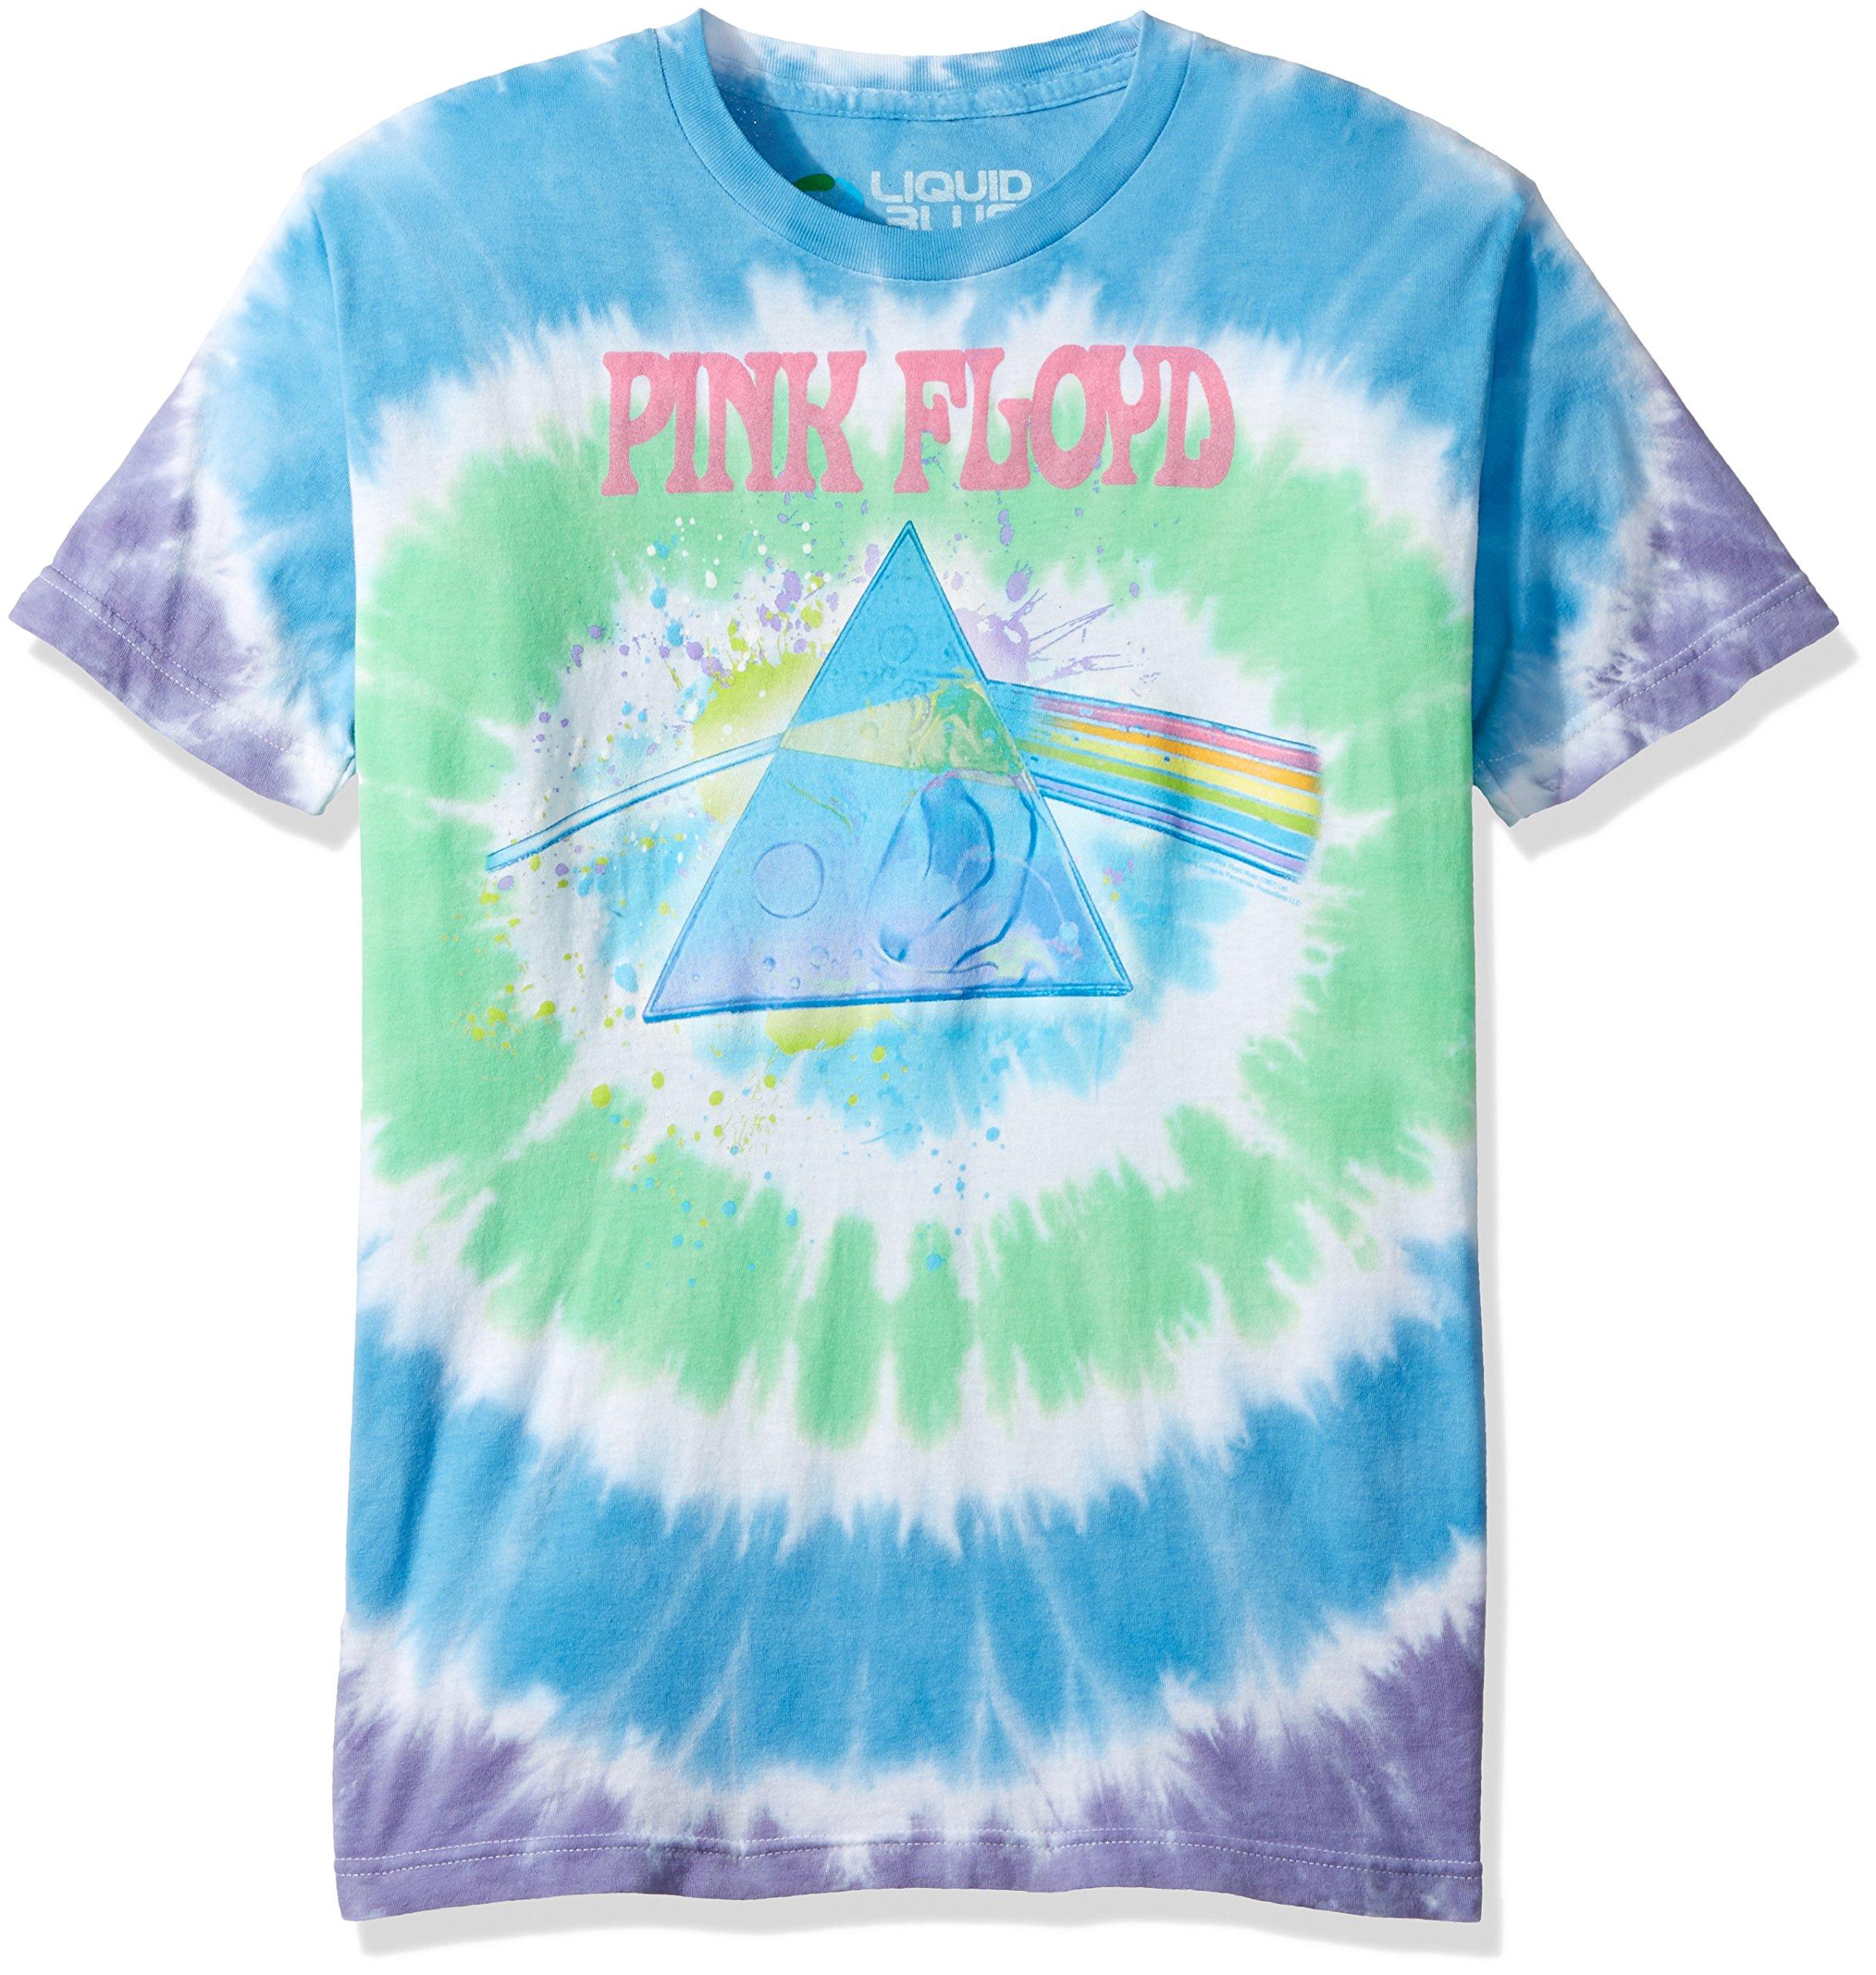 Liquid Blue Men's Pink Floyd Dark Side Oil Paint Tie Dye Short Sleeve T-Shirt, Multi Tie Dye, Large